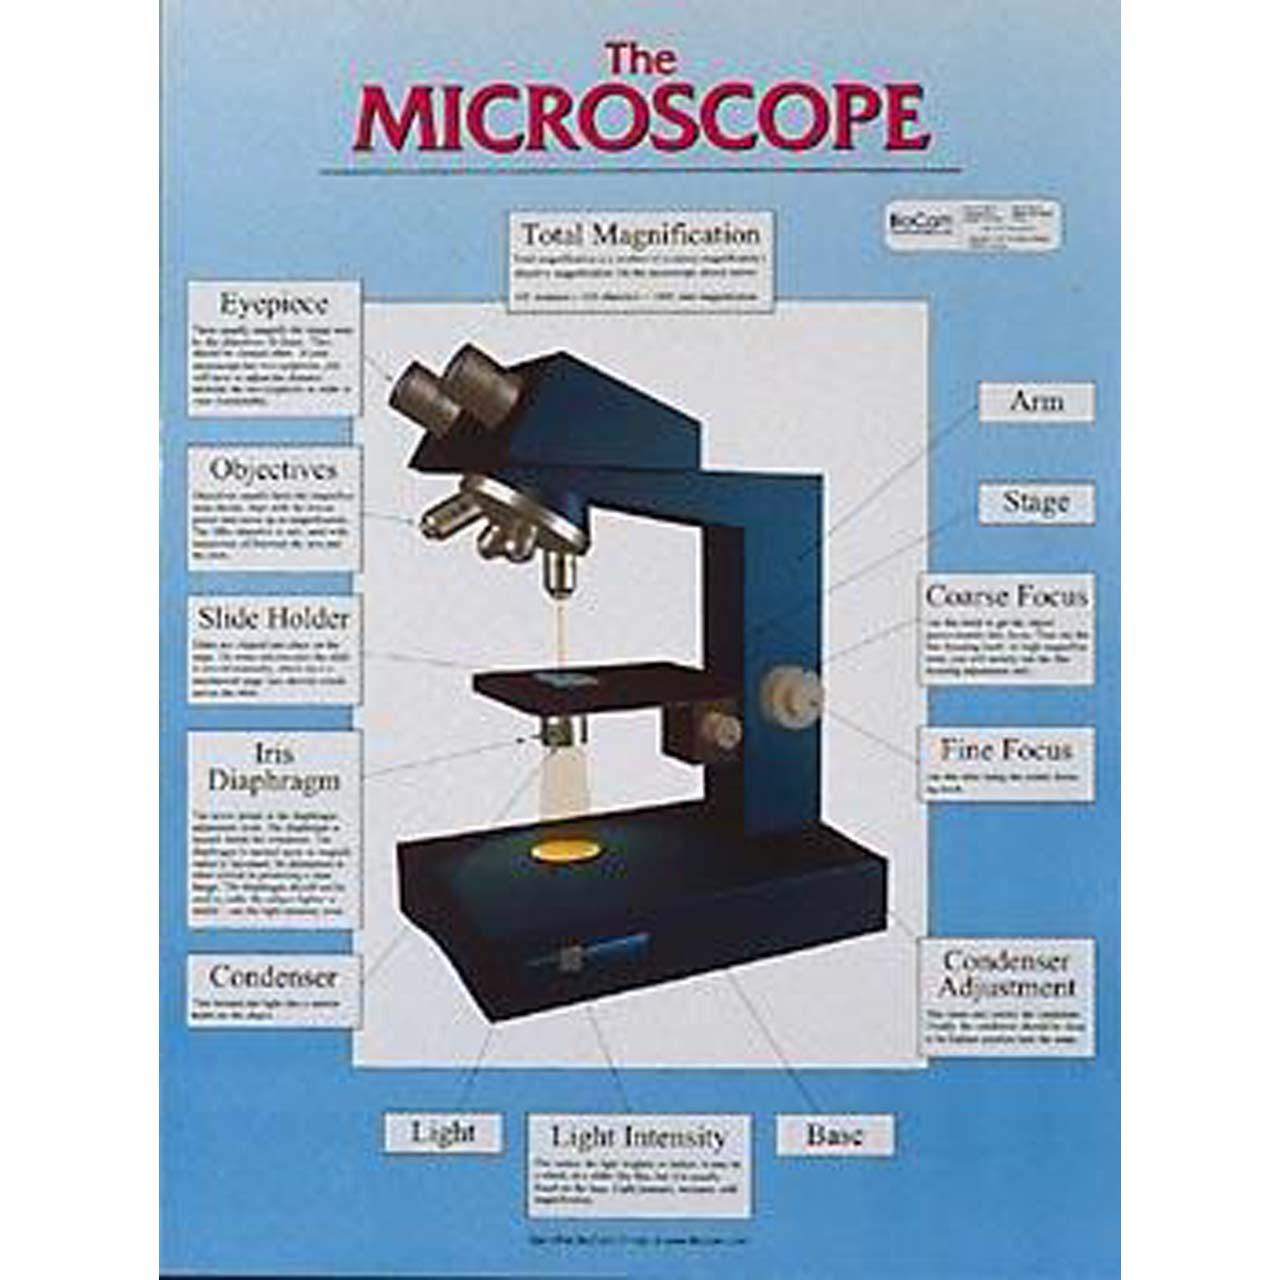 The microscope, Chart